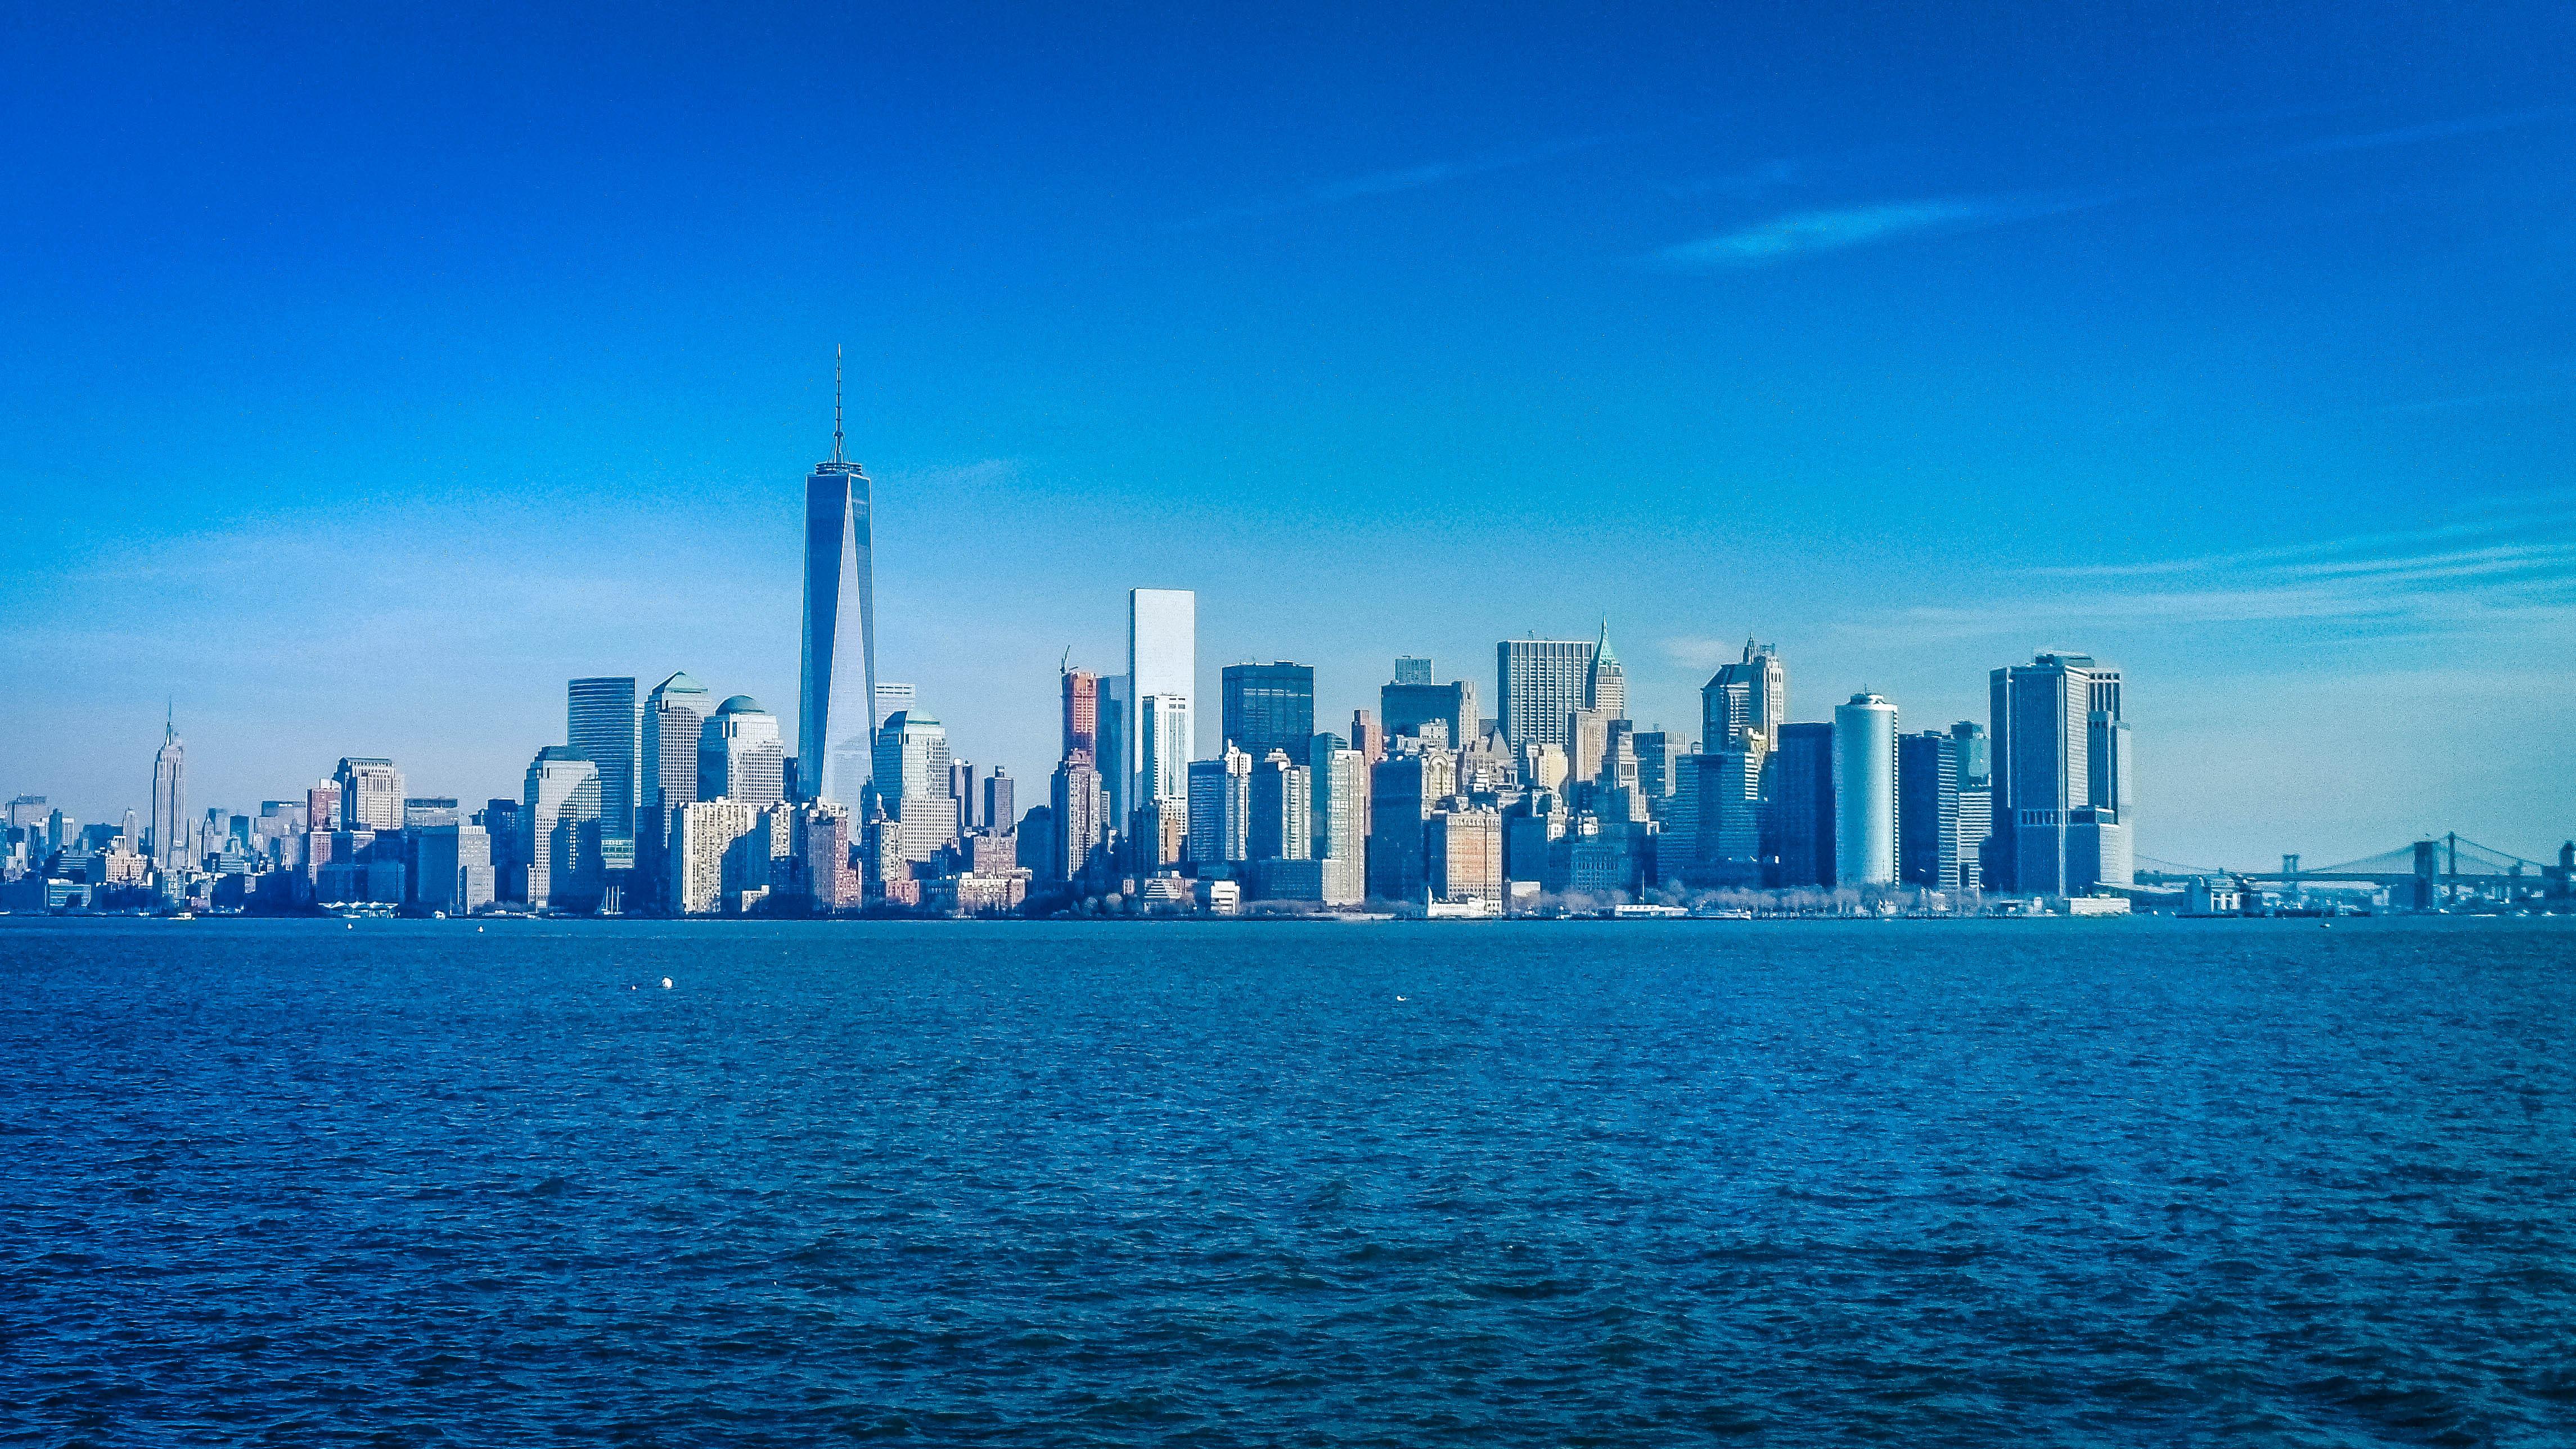 Flickr - Ellis island view; dreaming freedom